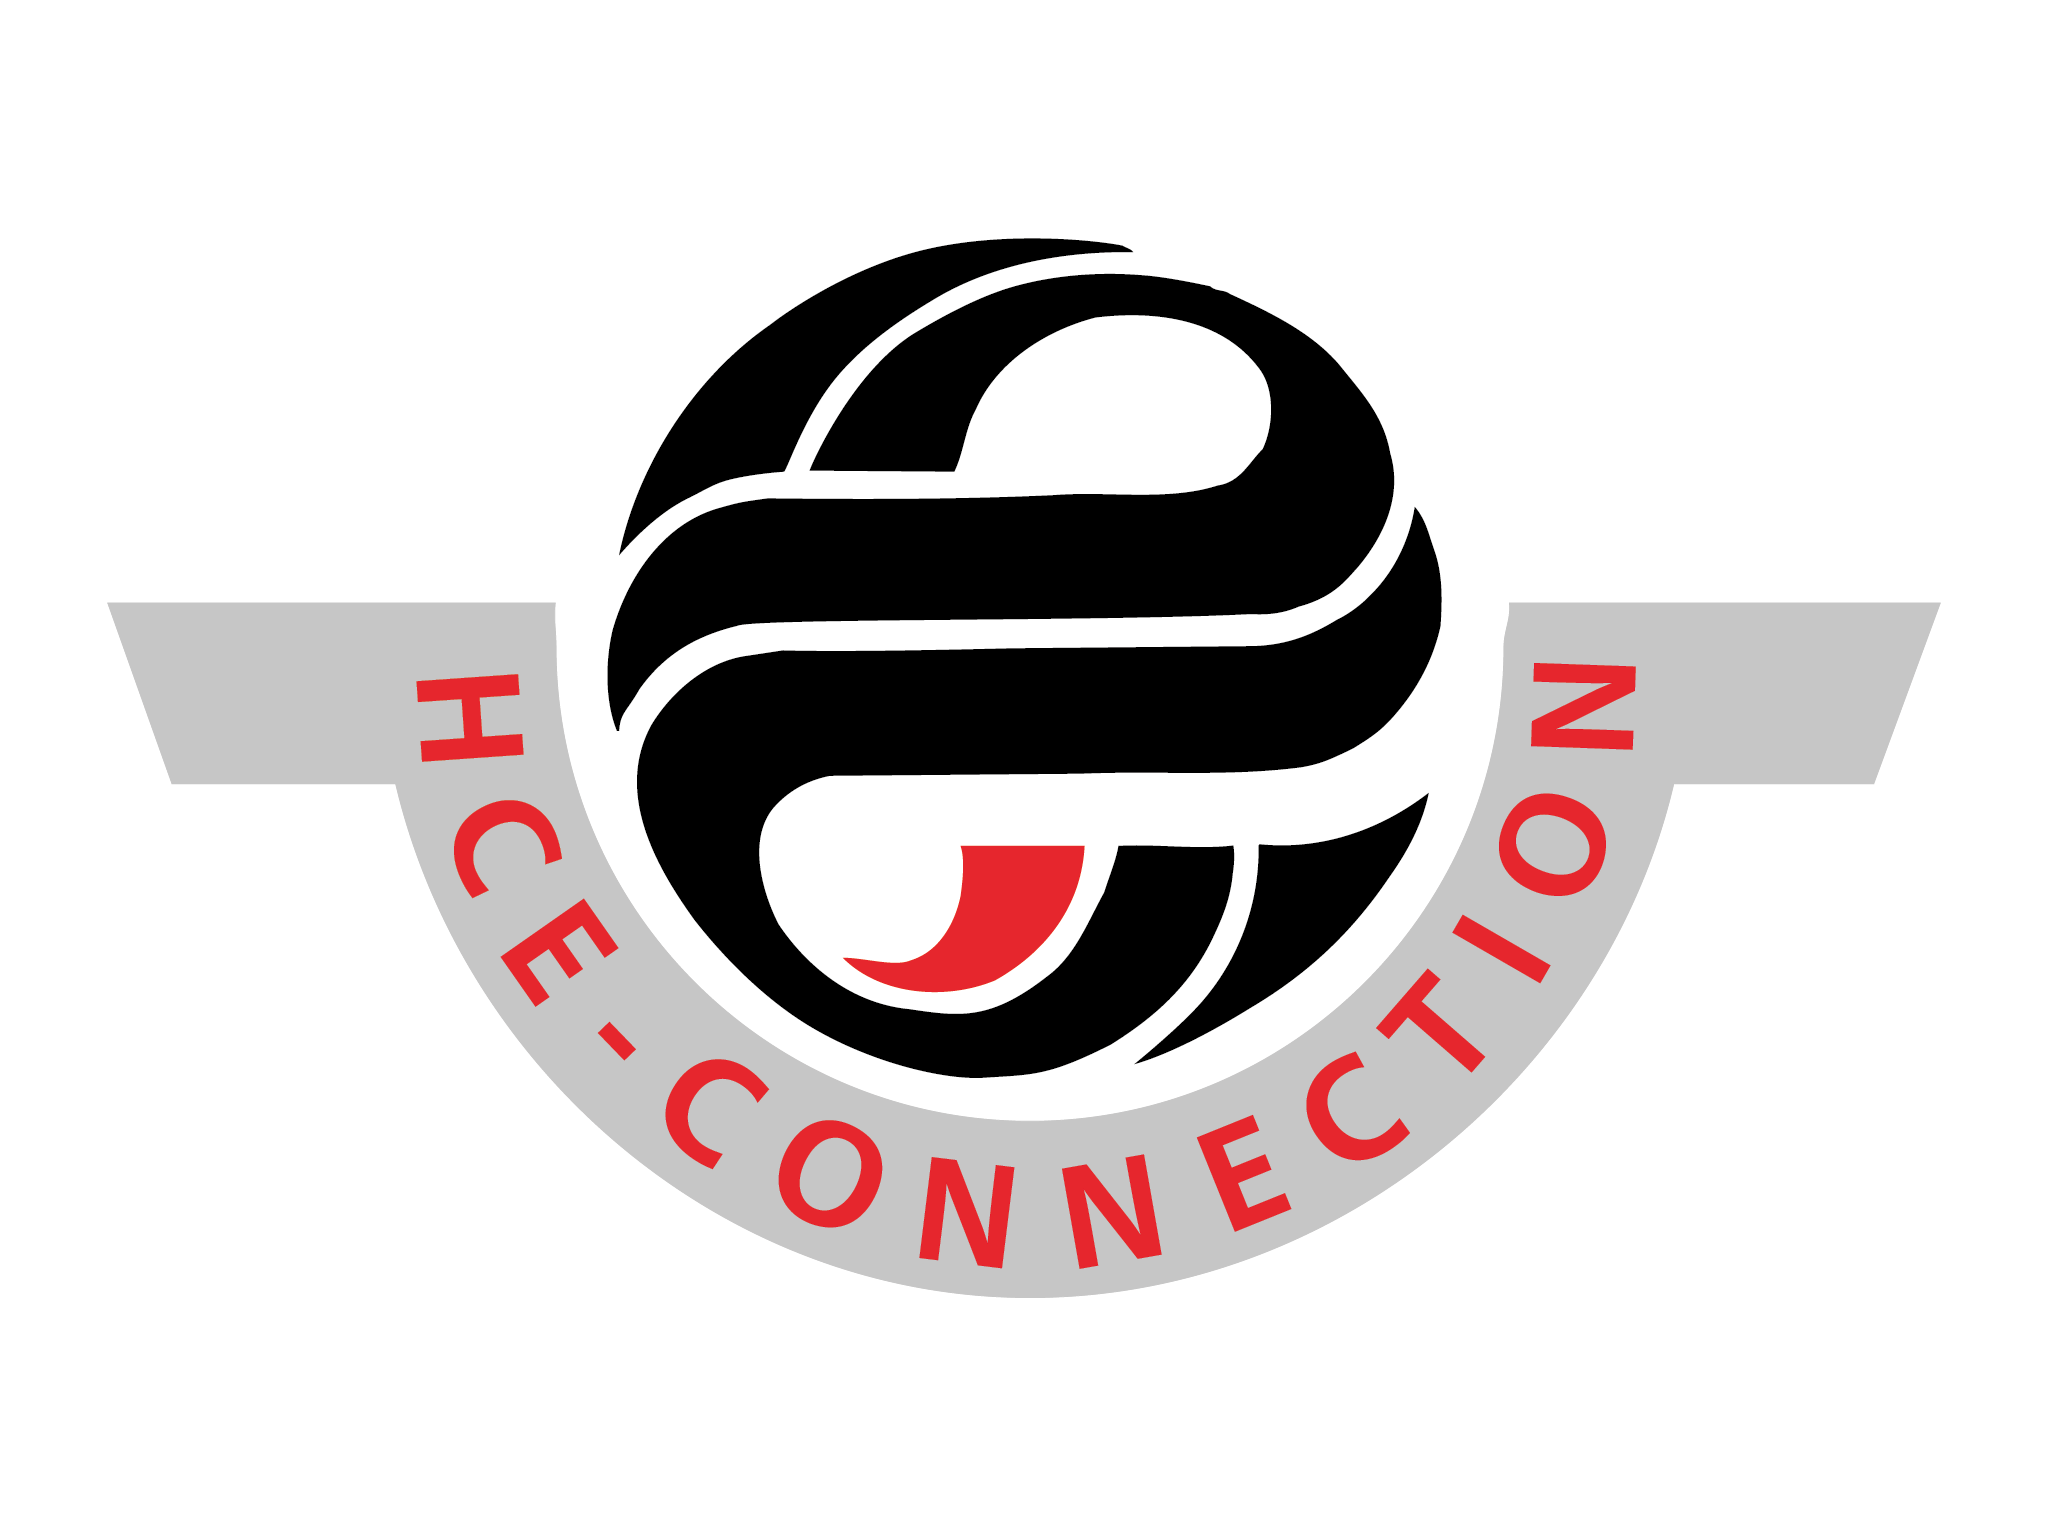 HCE-Connection, Emmen